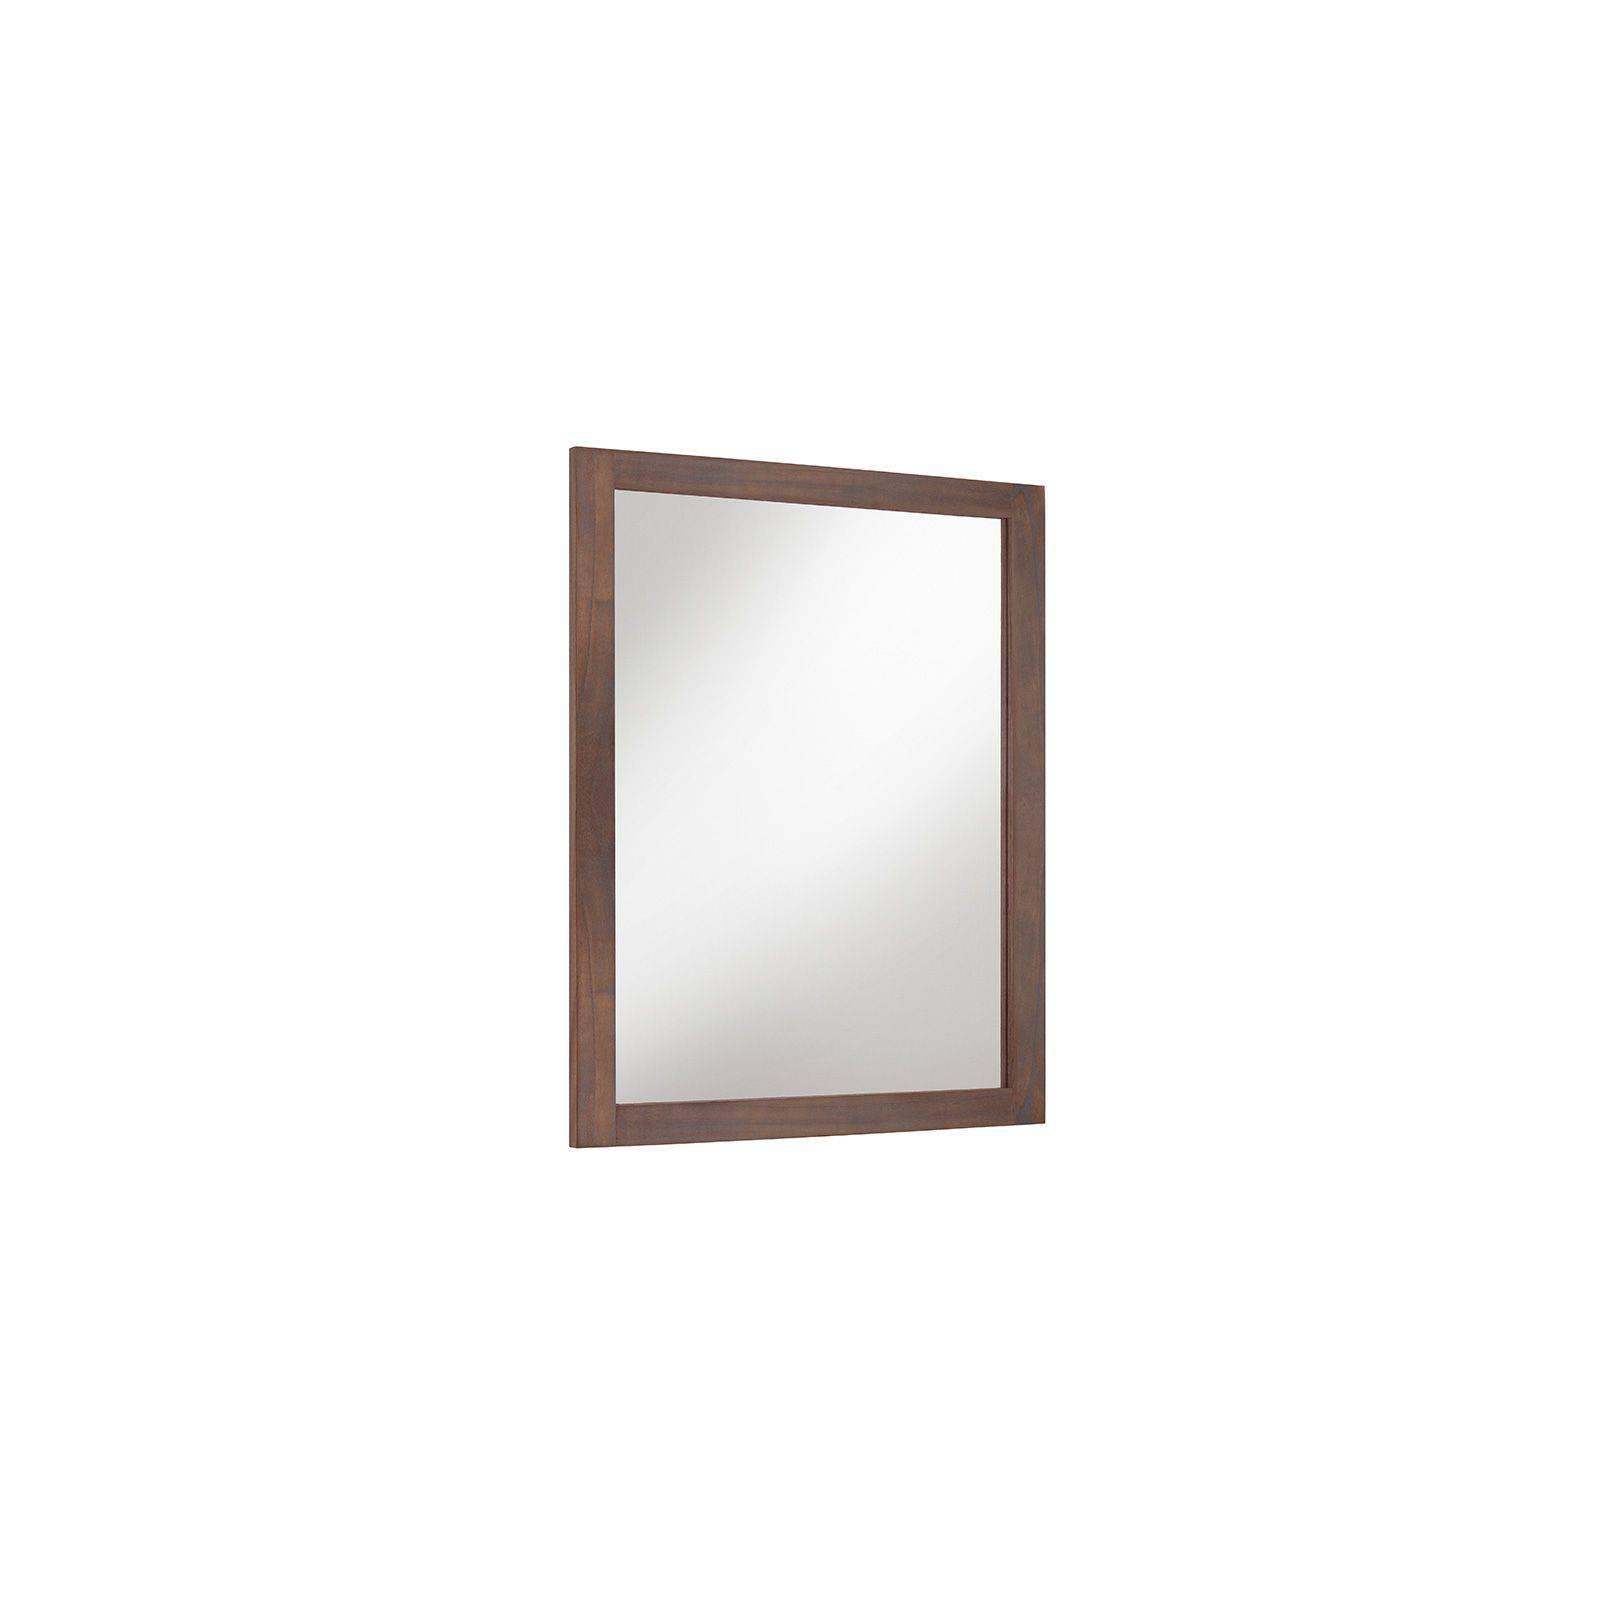 Miroir Vintage Mindi Massif - meuble déco